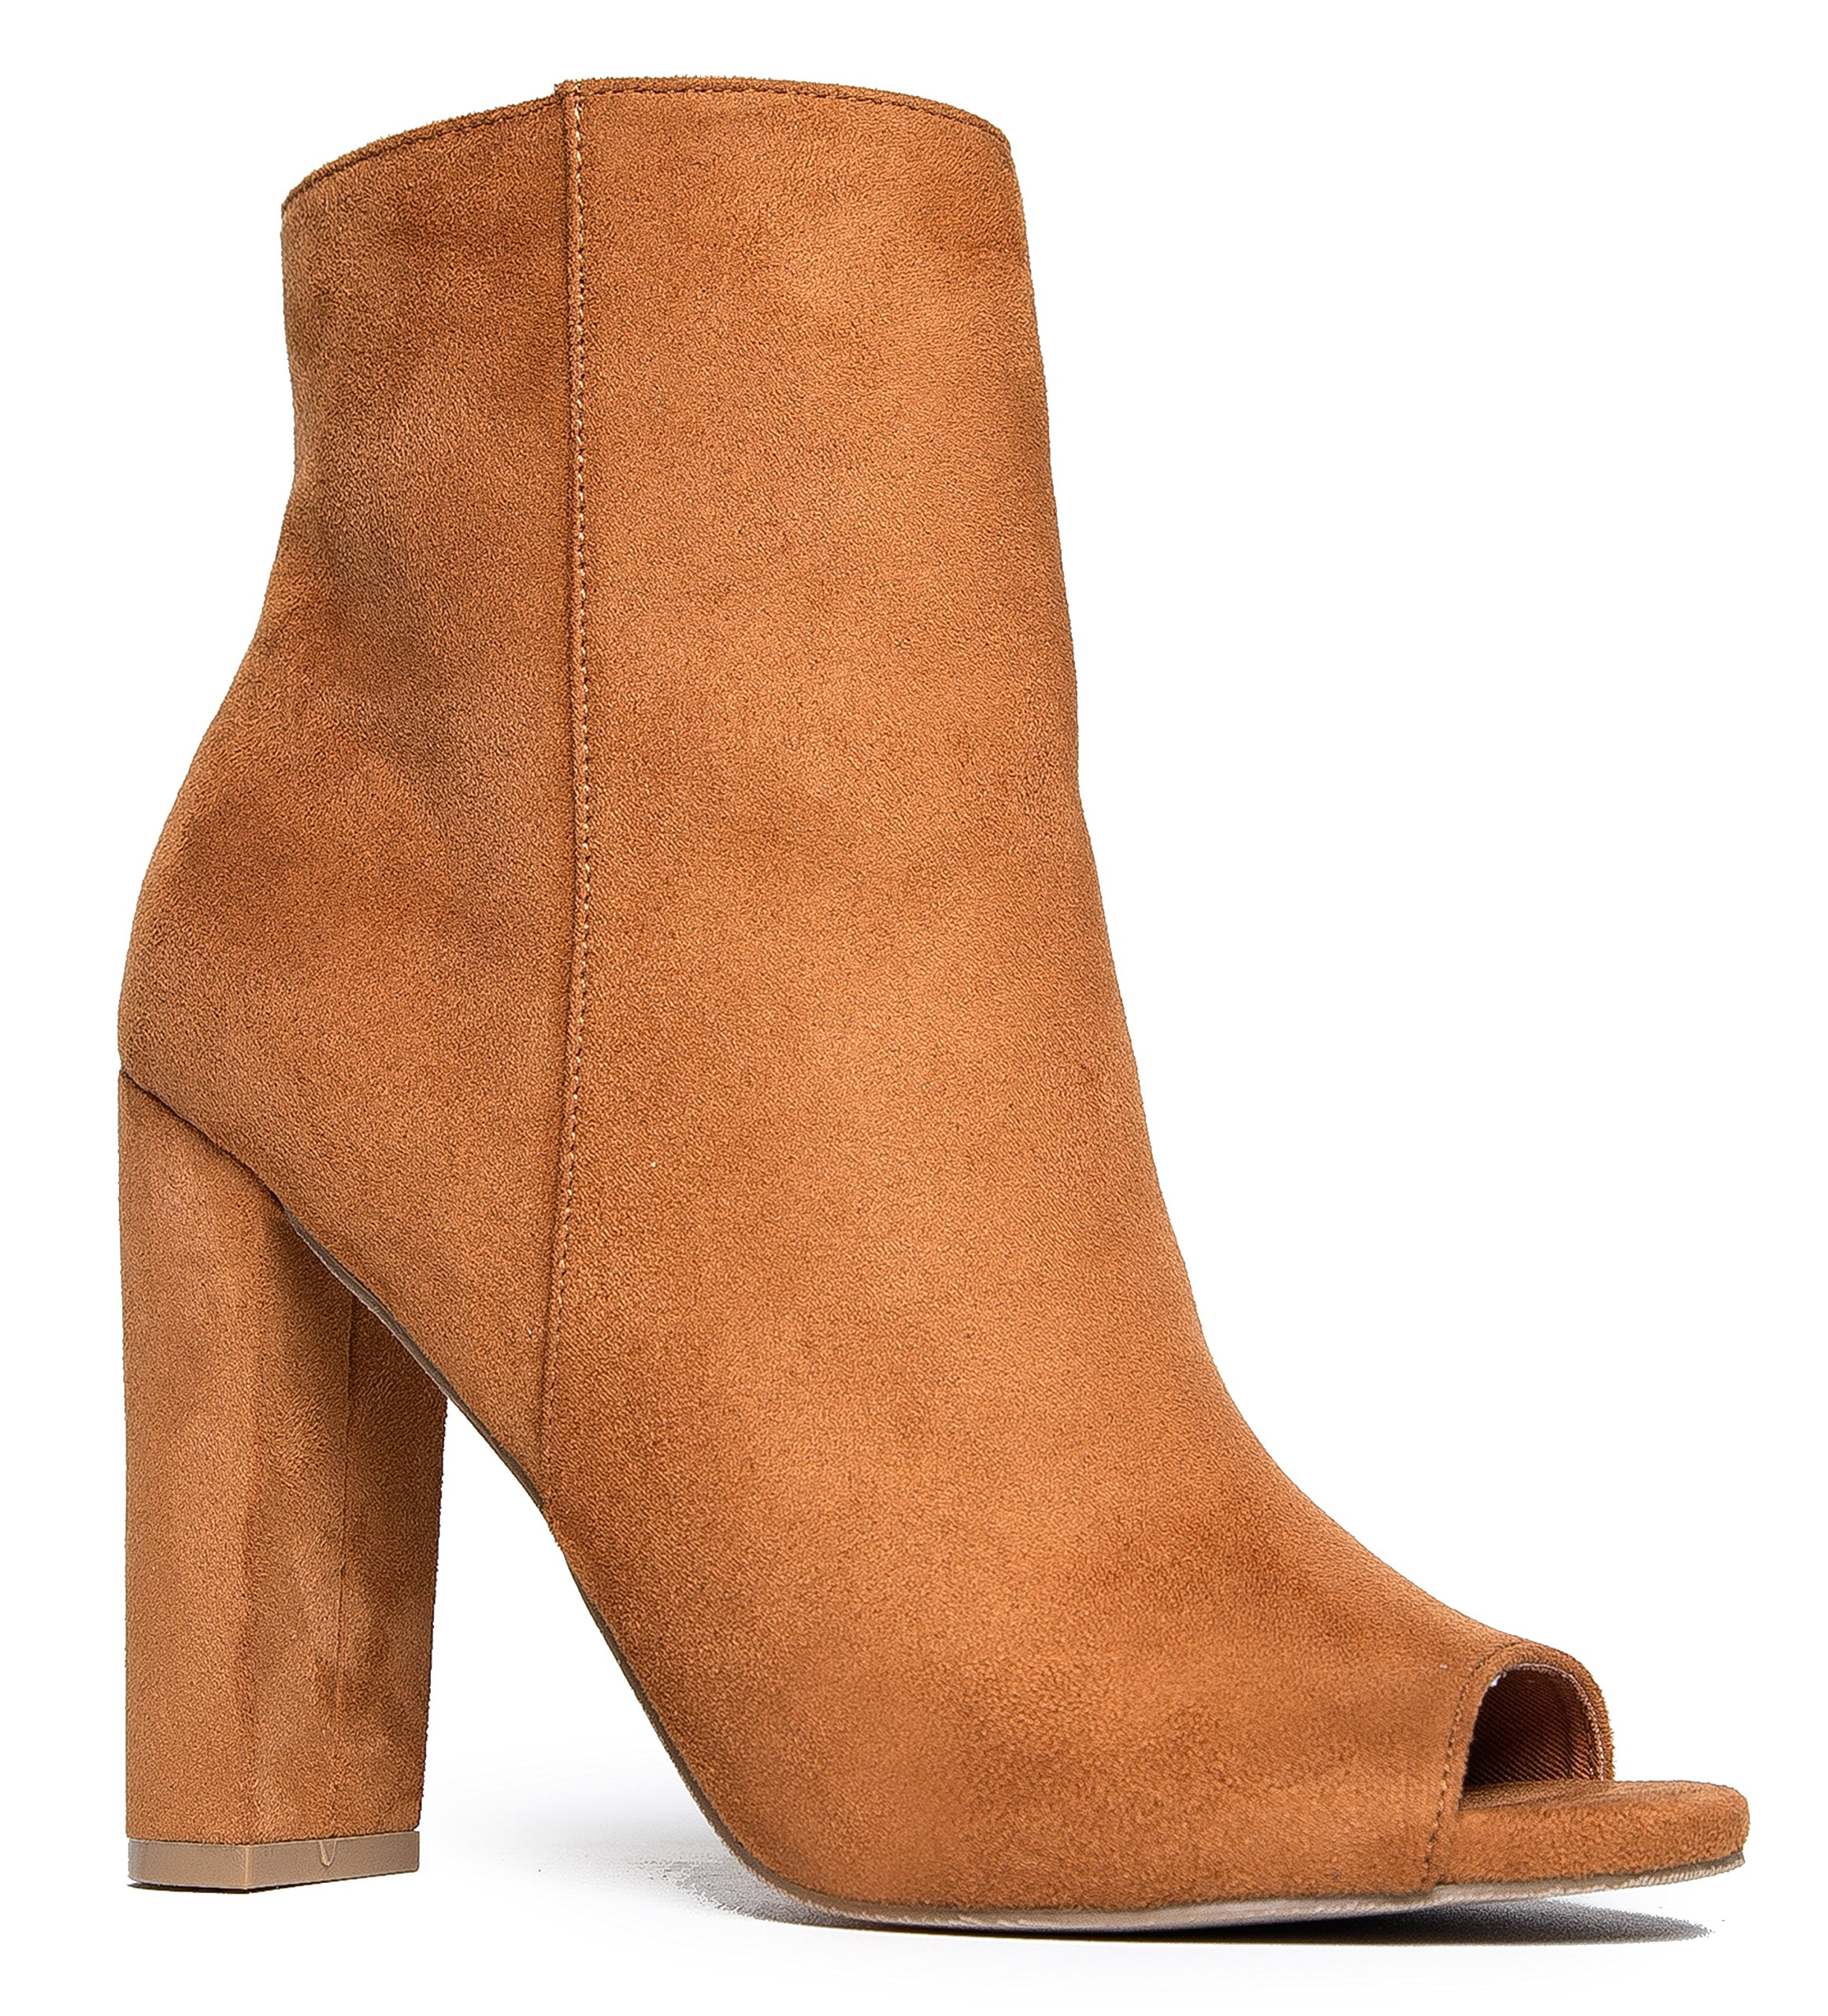 J. Adams Peep Toe Ankle Bootie – Classic Sleek High Heel Boot – Essential Zip Up Chunky Heel Shoe – Savoy